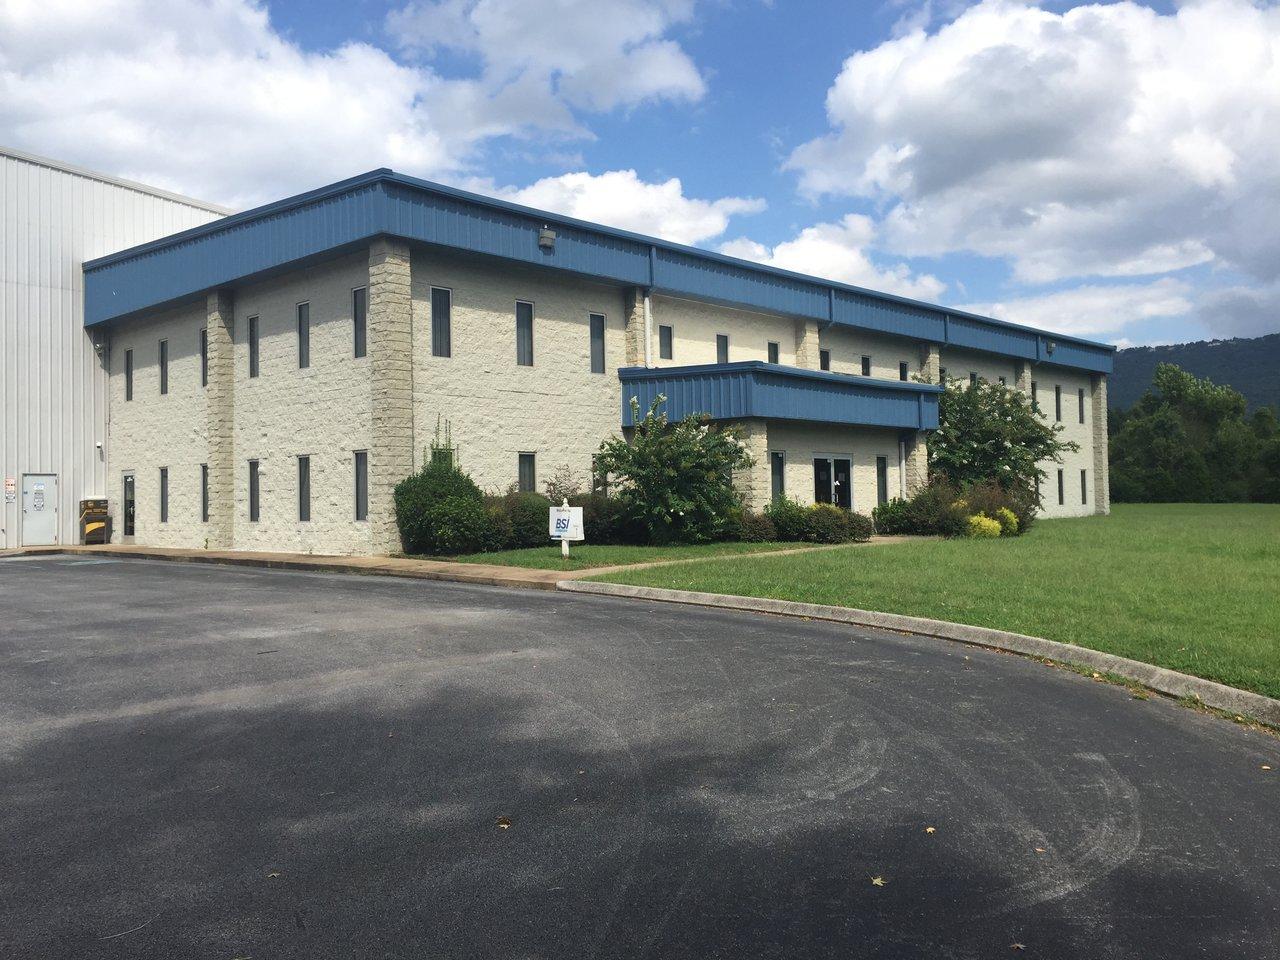 3600 Cummings Rd, Chattanooga, TN, 37419 Chattanooga,TN